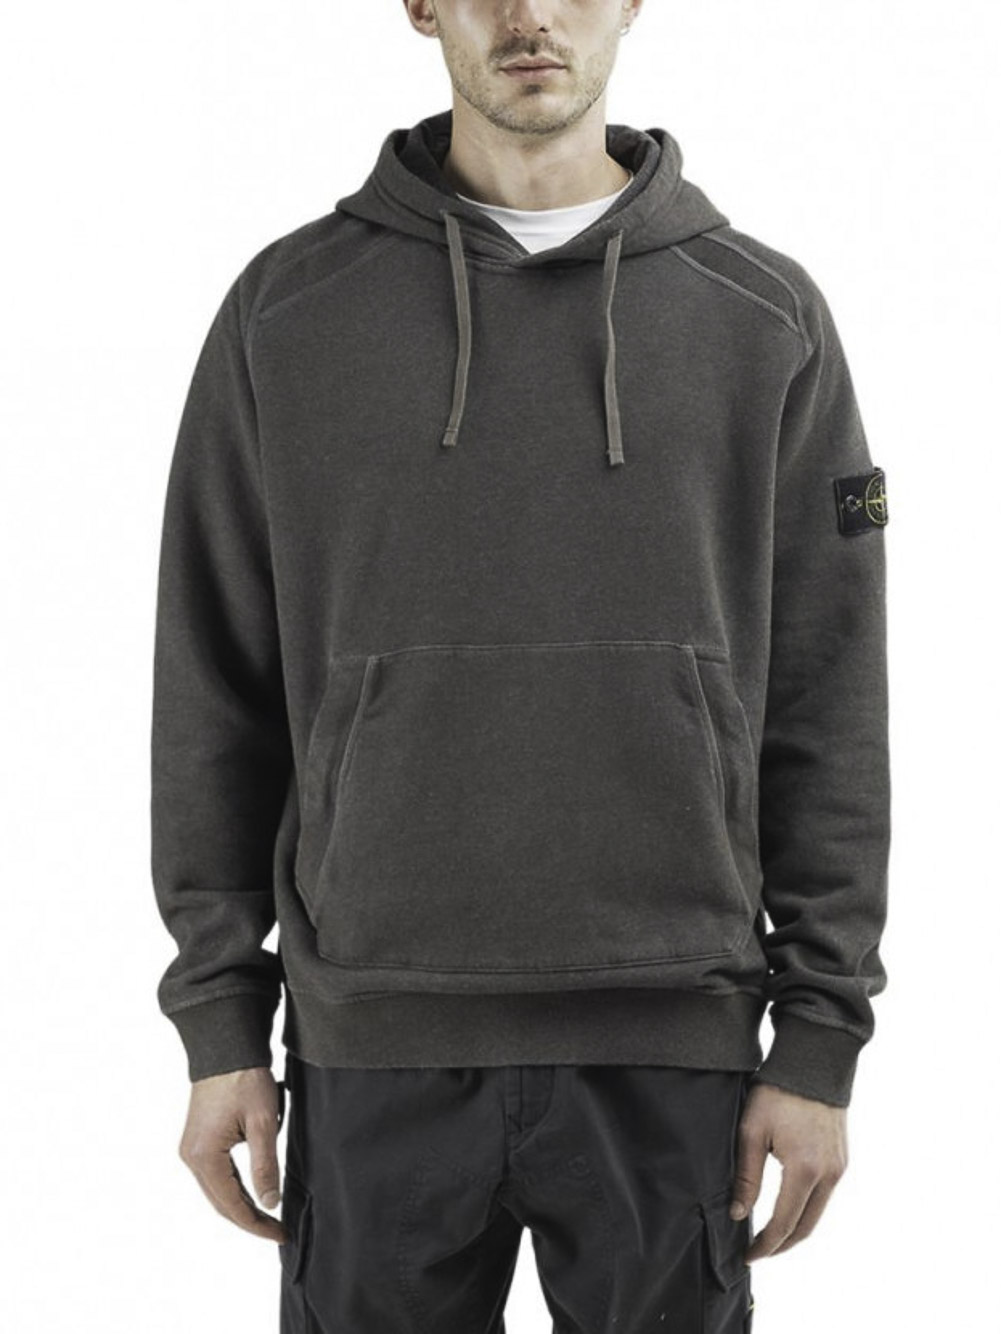 STONE ISLAND Μπλούζα φούτερ με κουκούλα MO731562090-V2M71 ΚΑΦΕ